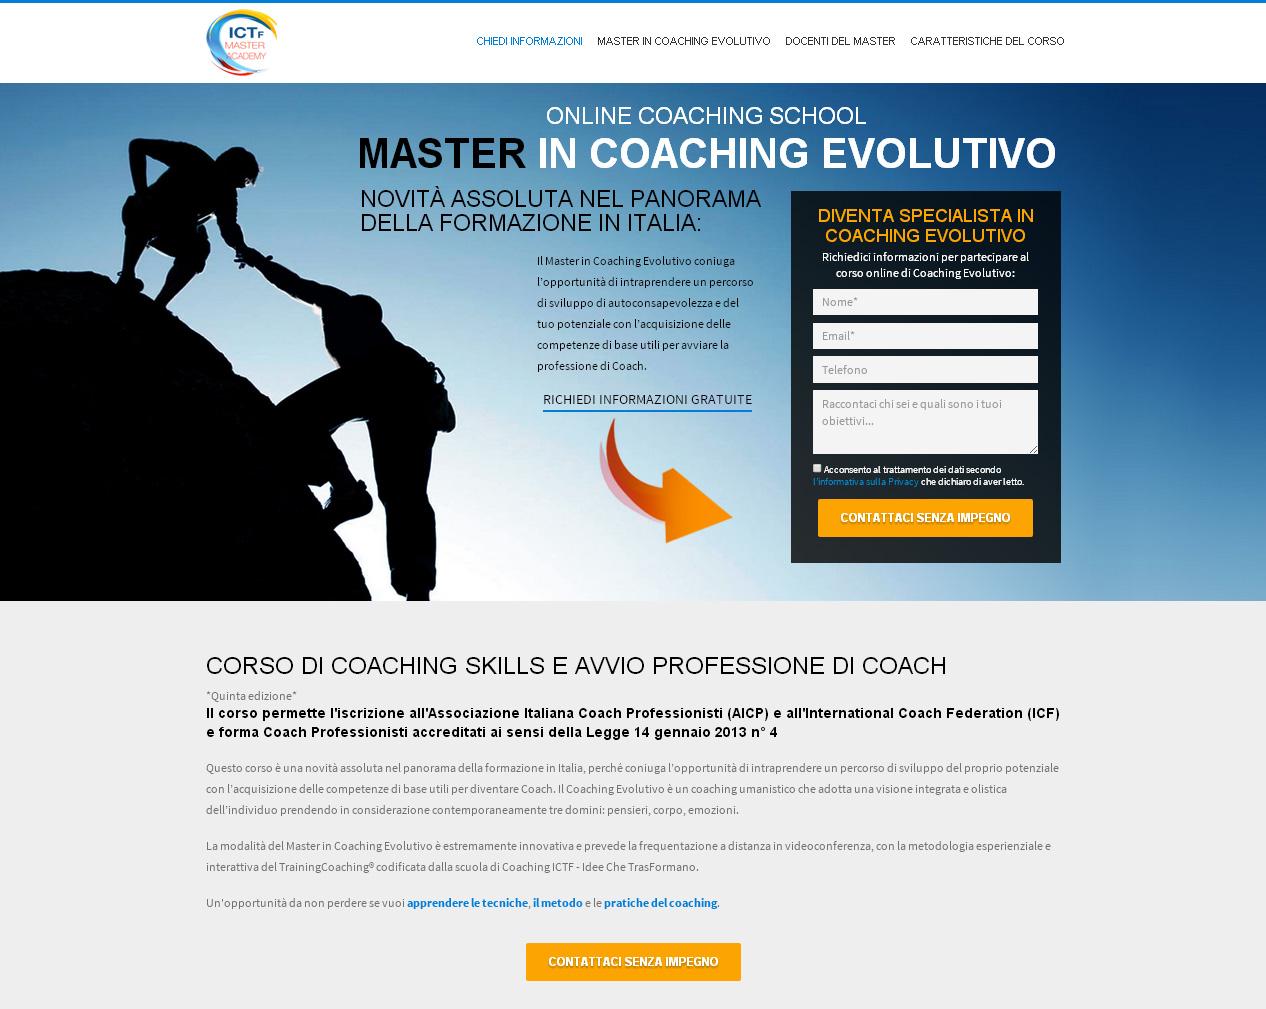 Master in Coaching Evolutivo: campagna AdWords